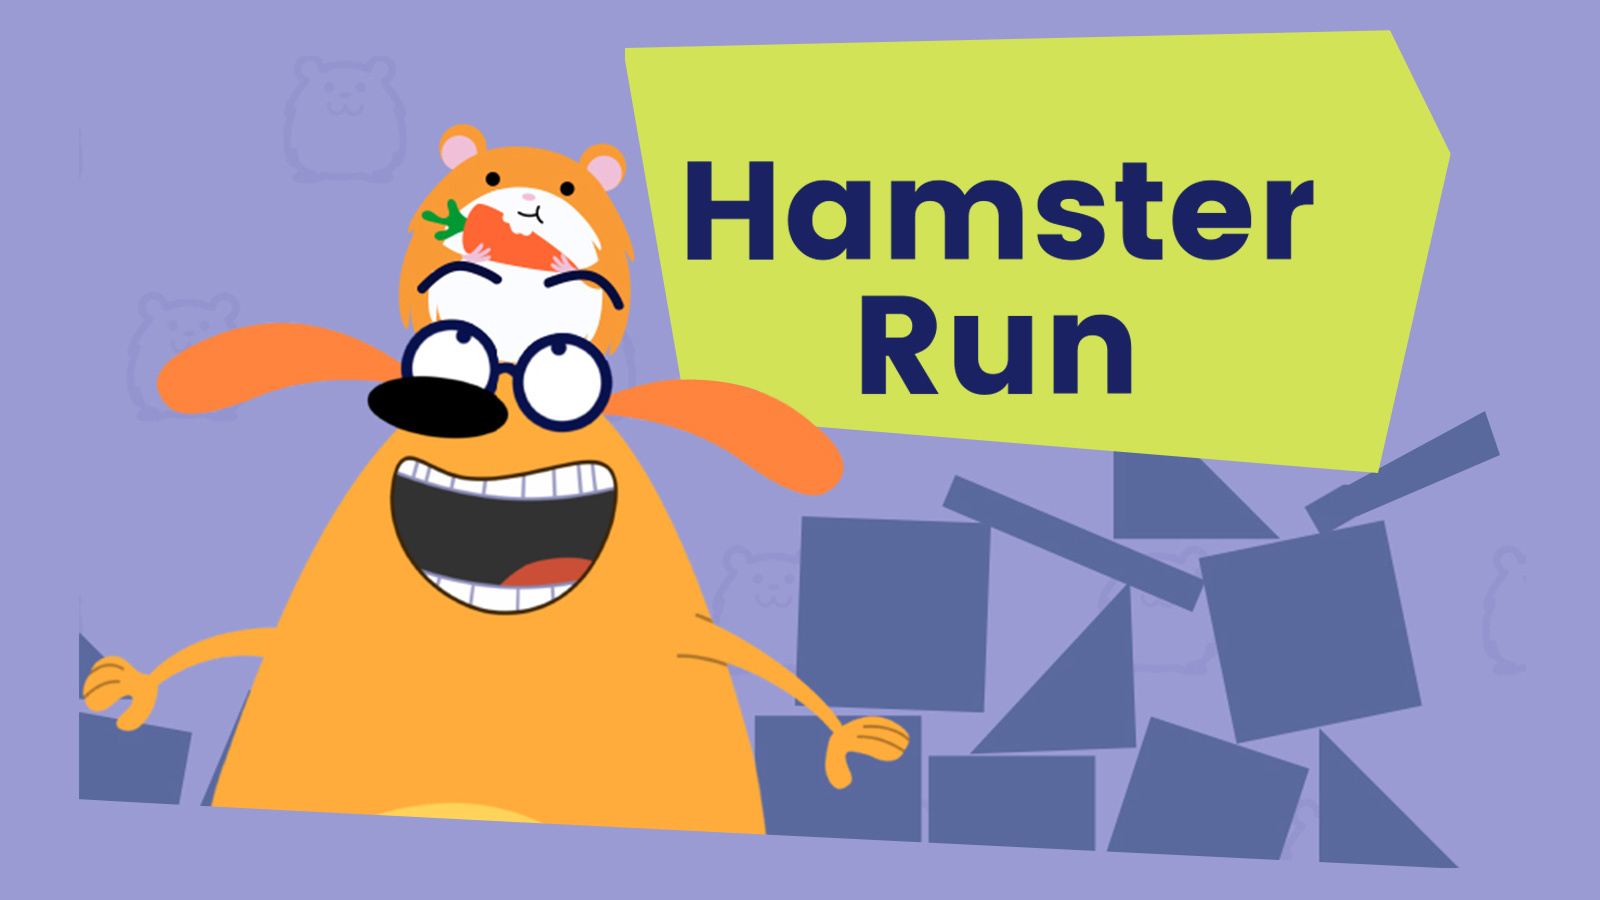 Hamster Run game